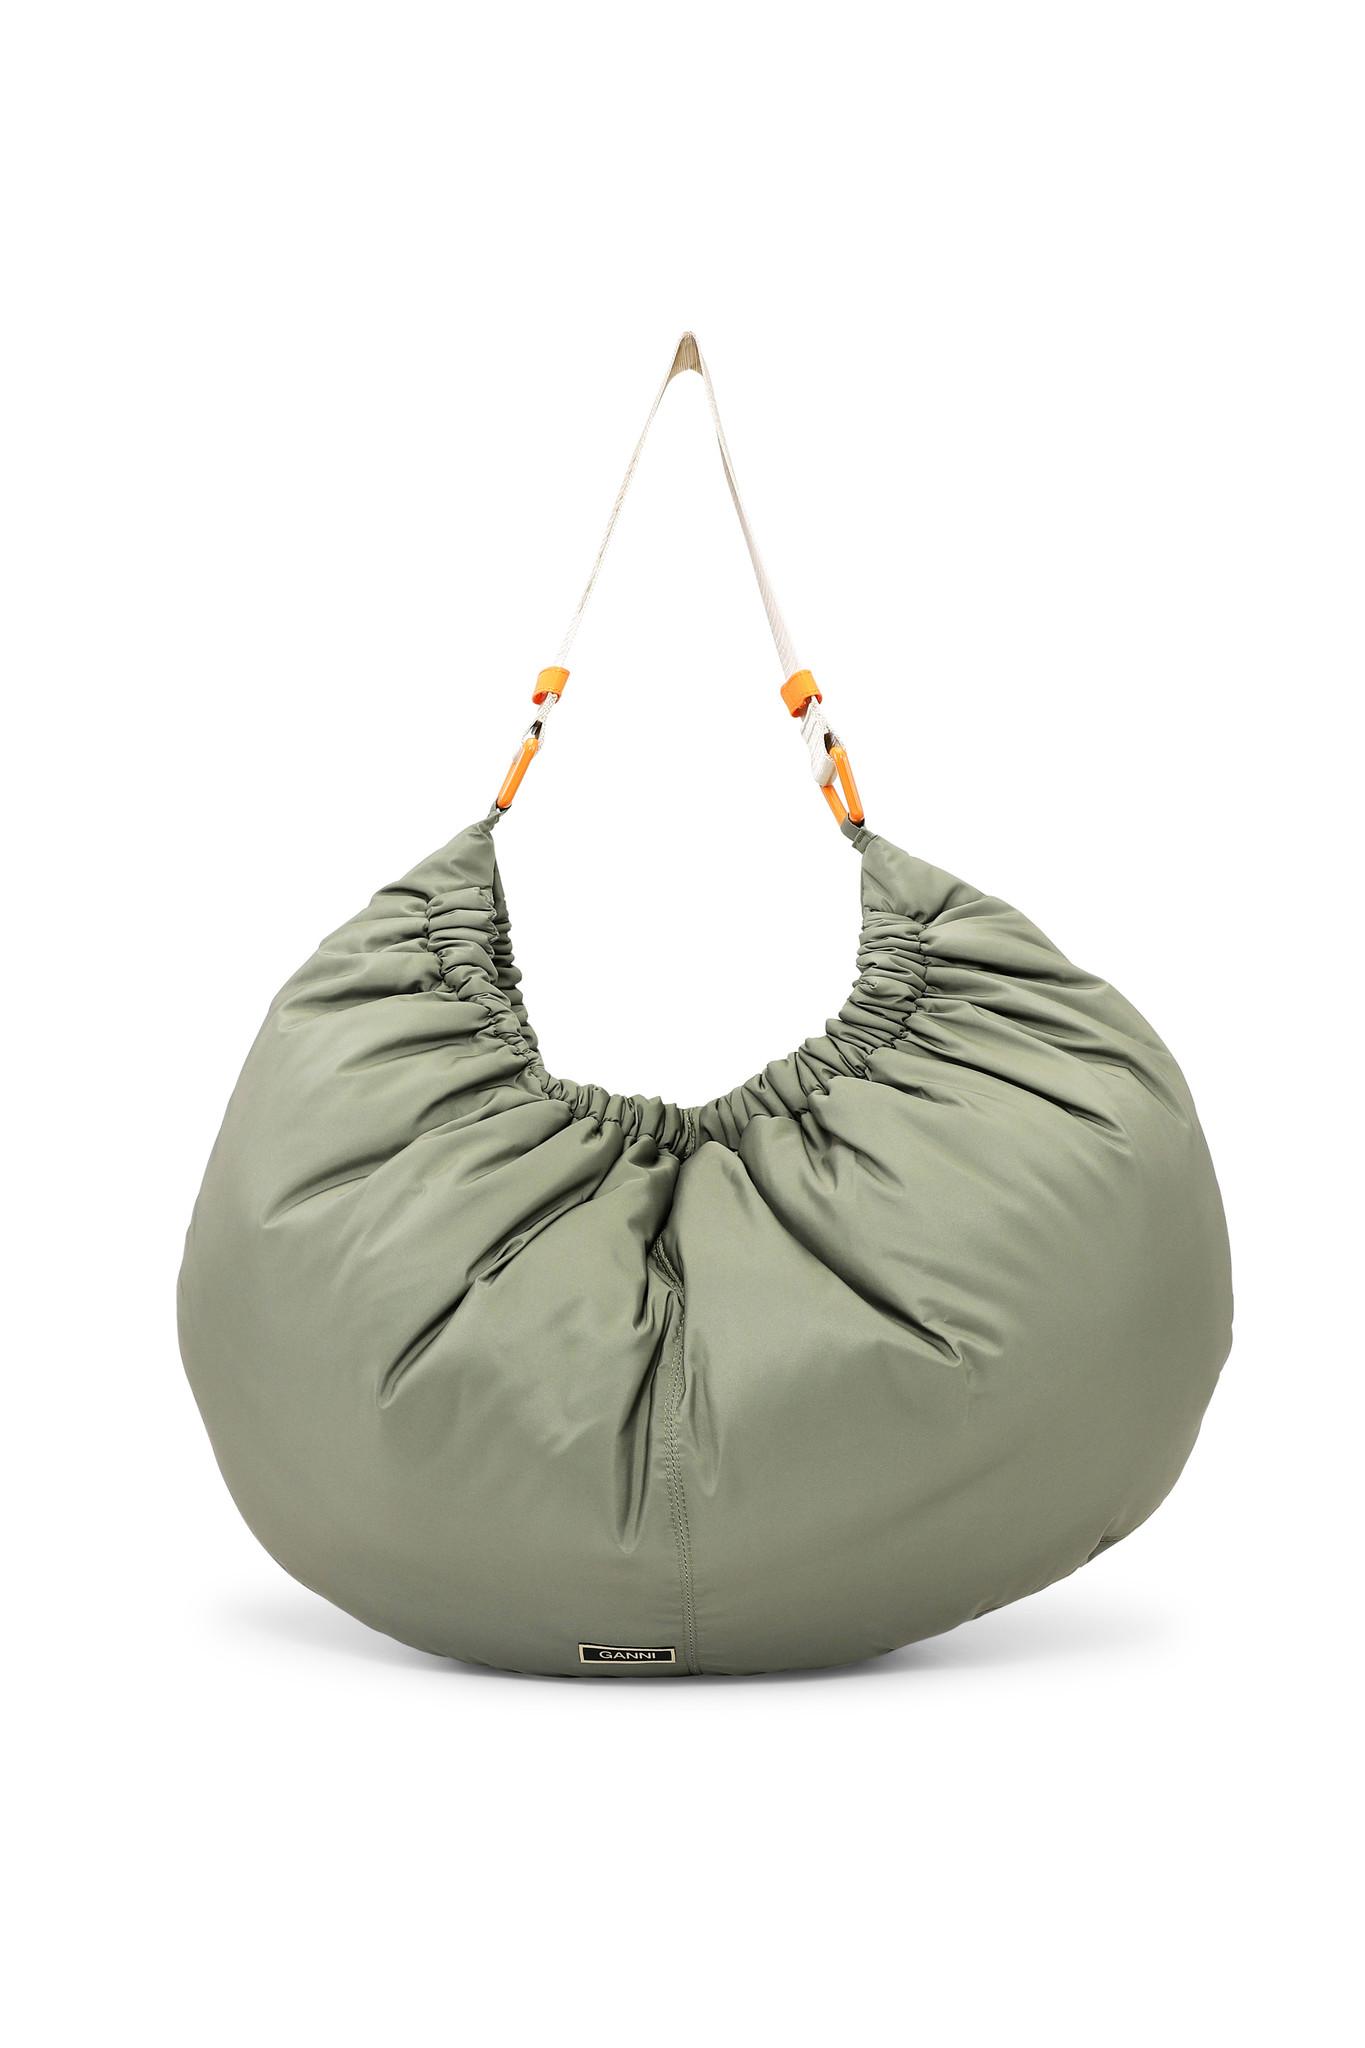 GANNI Recycled Nylon XXL Bag in Olive